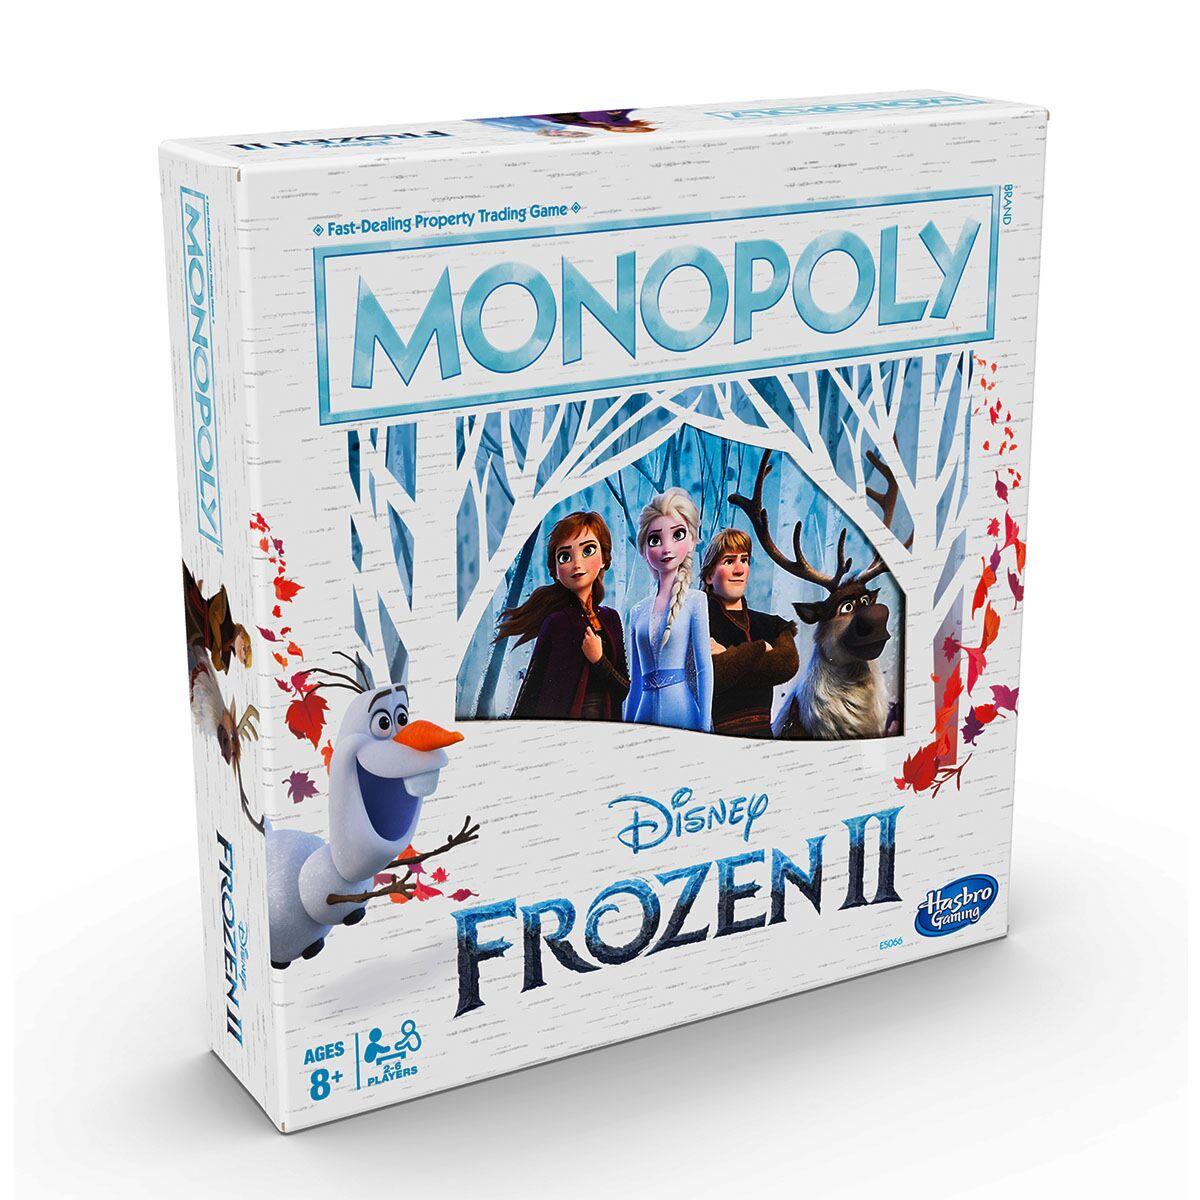 Frozen 2 Monopoly Board Game £14.99 free c&c Robert Dyas